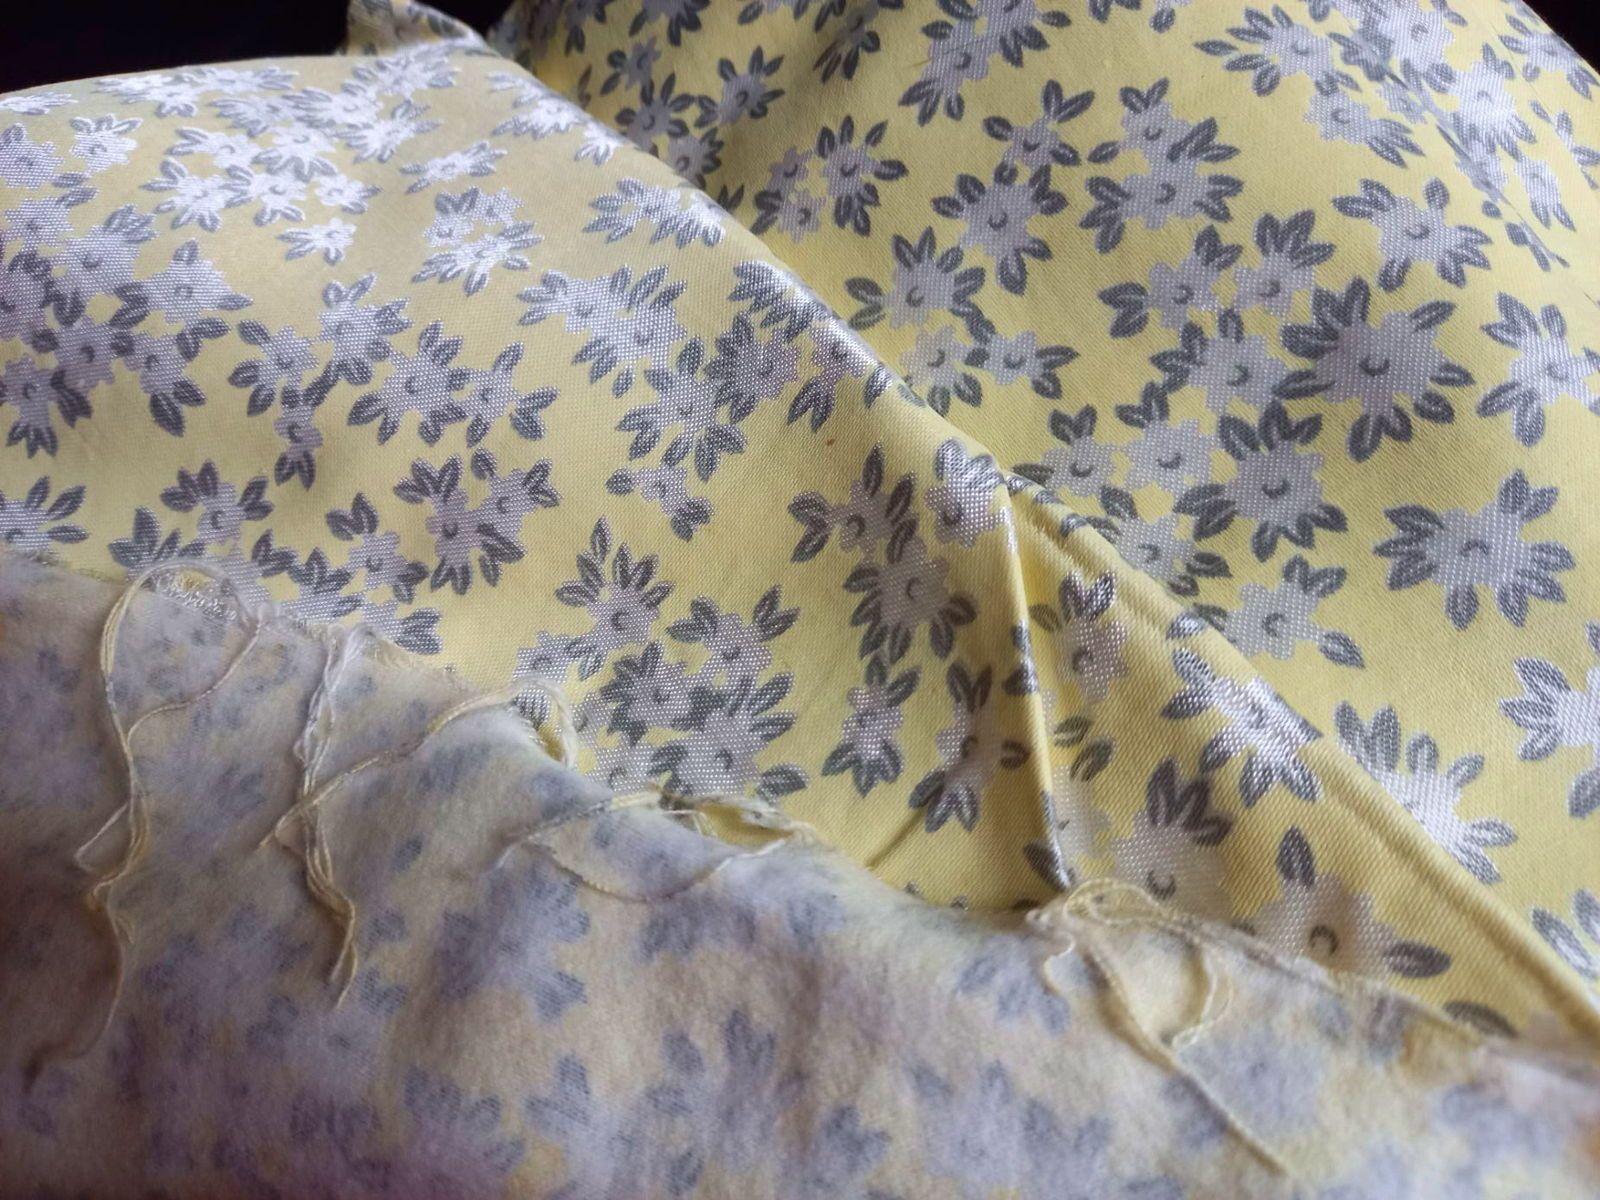 Tissu satin de soie moletonné ancien Neuf TBE Pyjama, doublure, robe